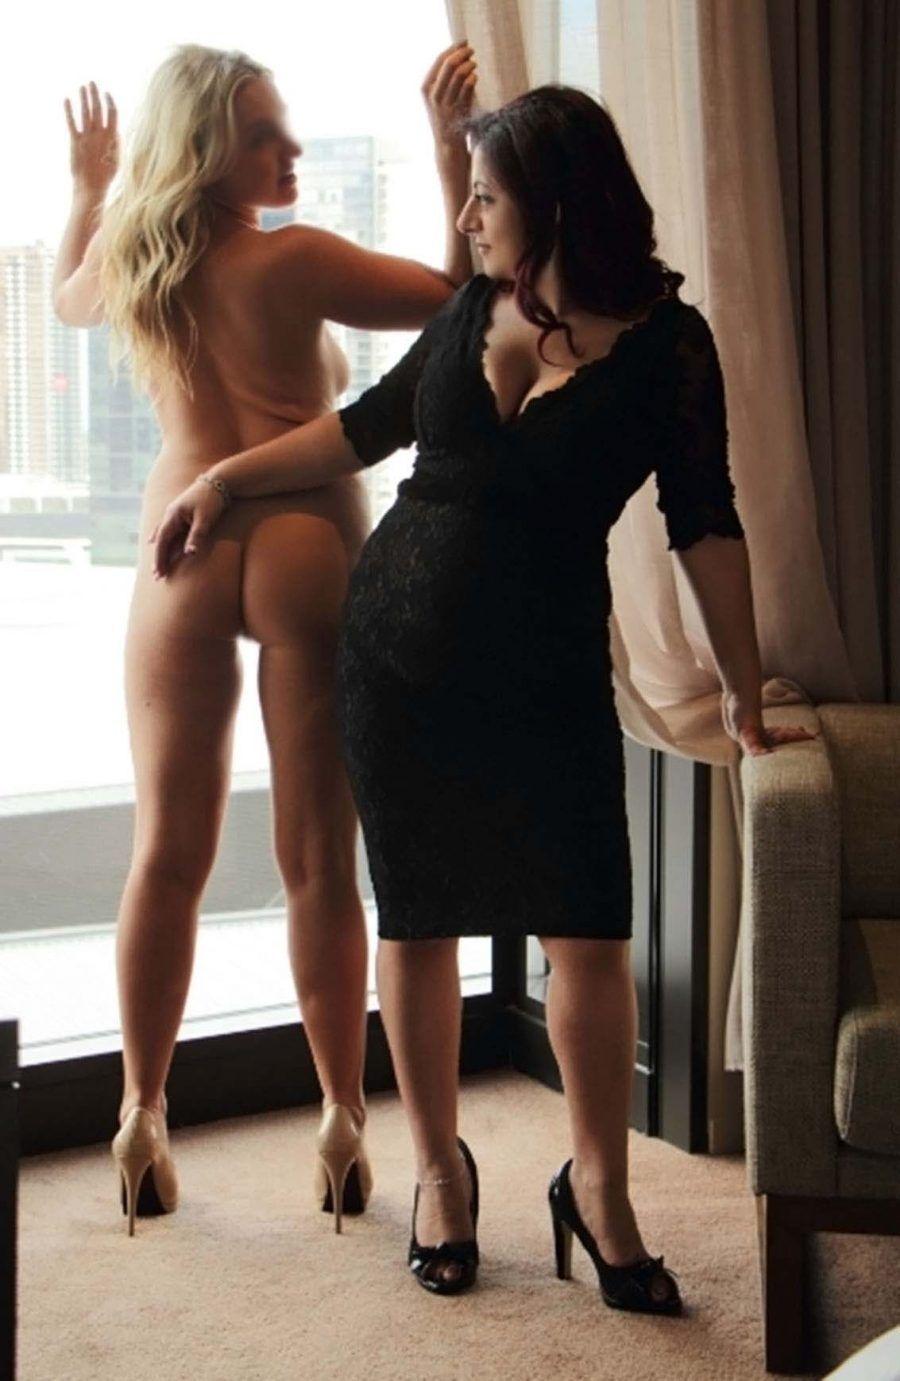 Independent escort in melbourne